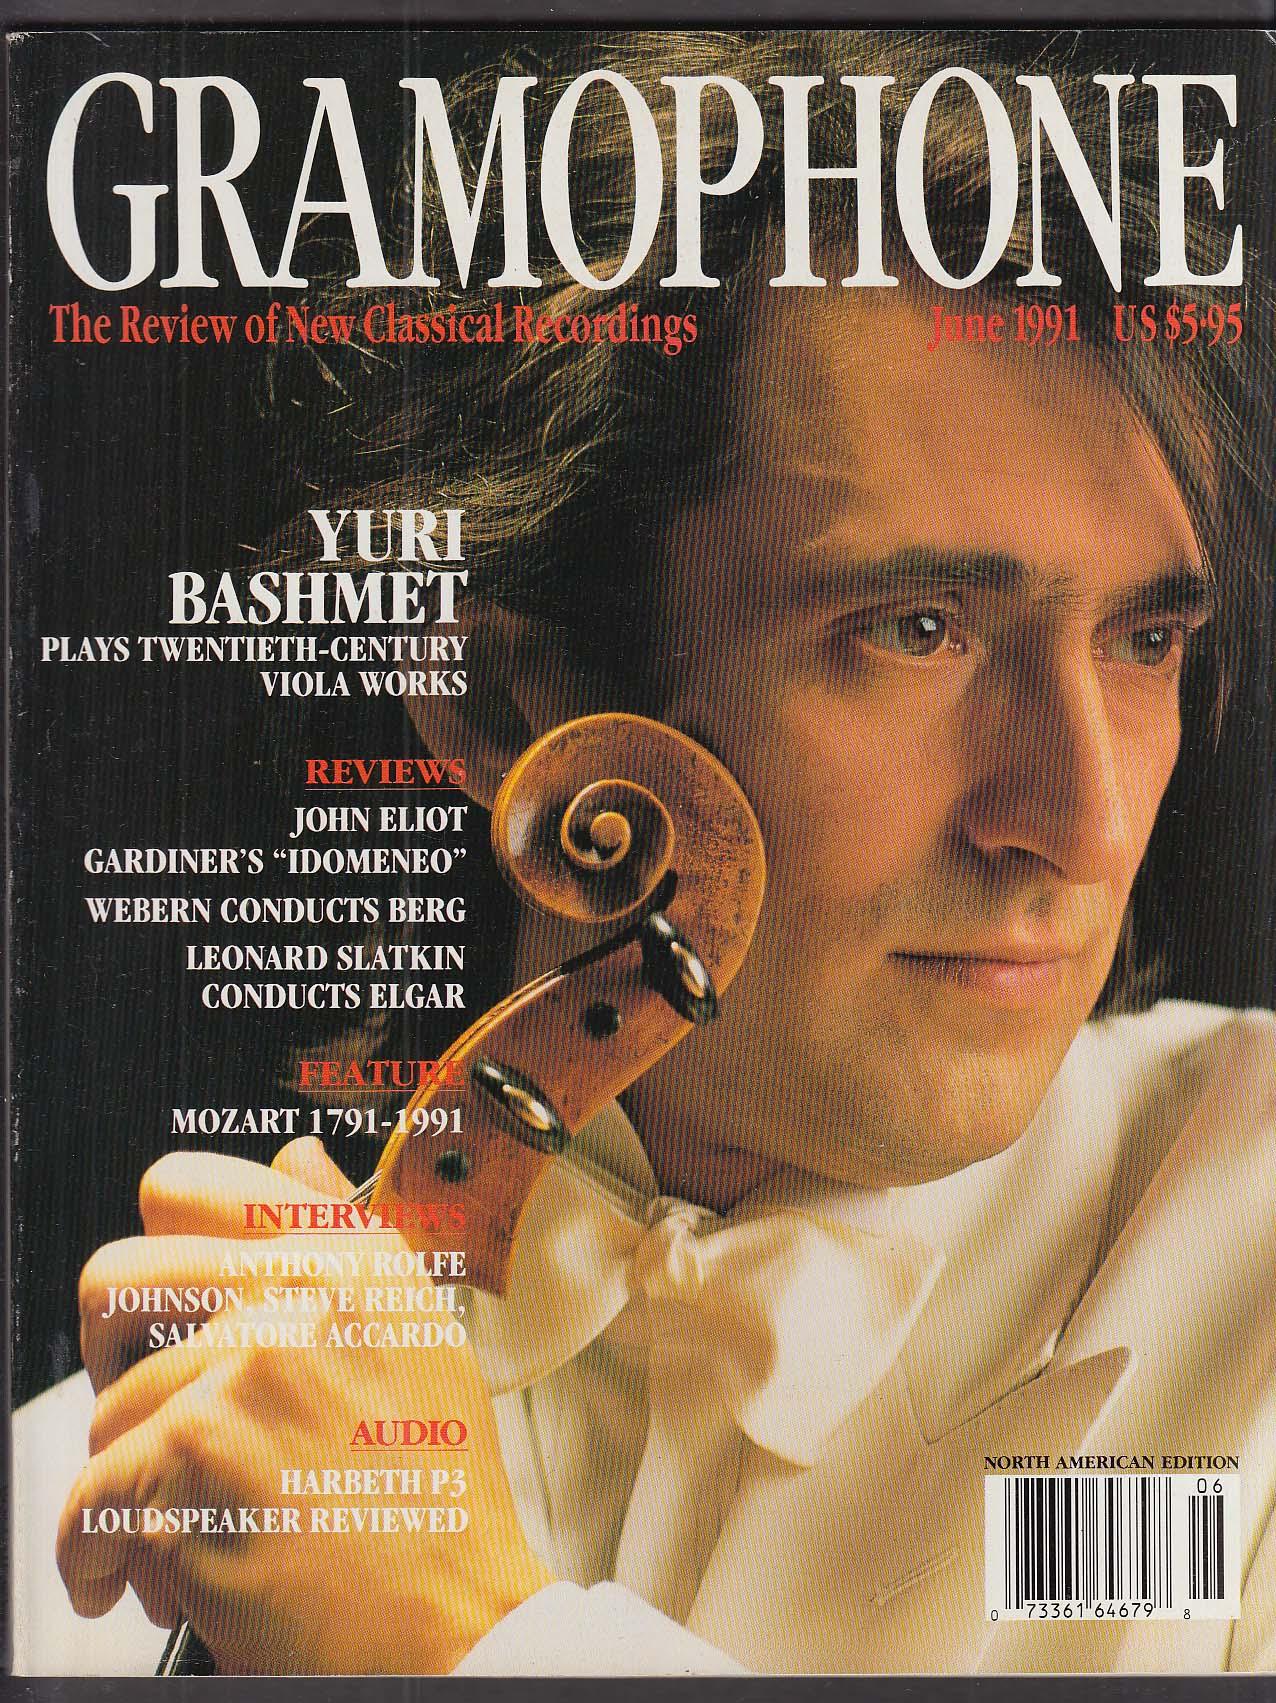 GRAMOPHONE Yuri Bashmet Salvatore Accardo Rolfe Johnson Steve Reich ++ 6 1991